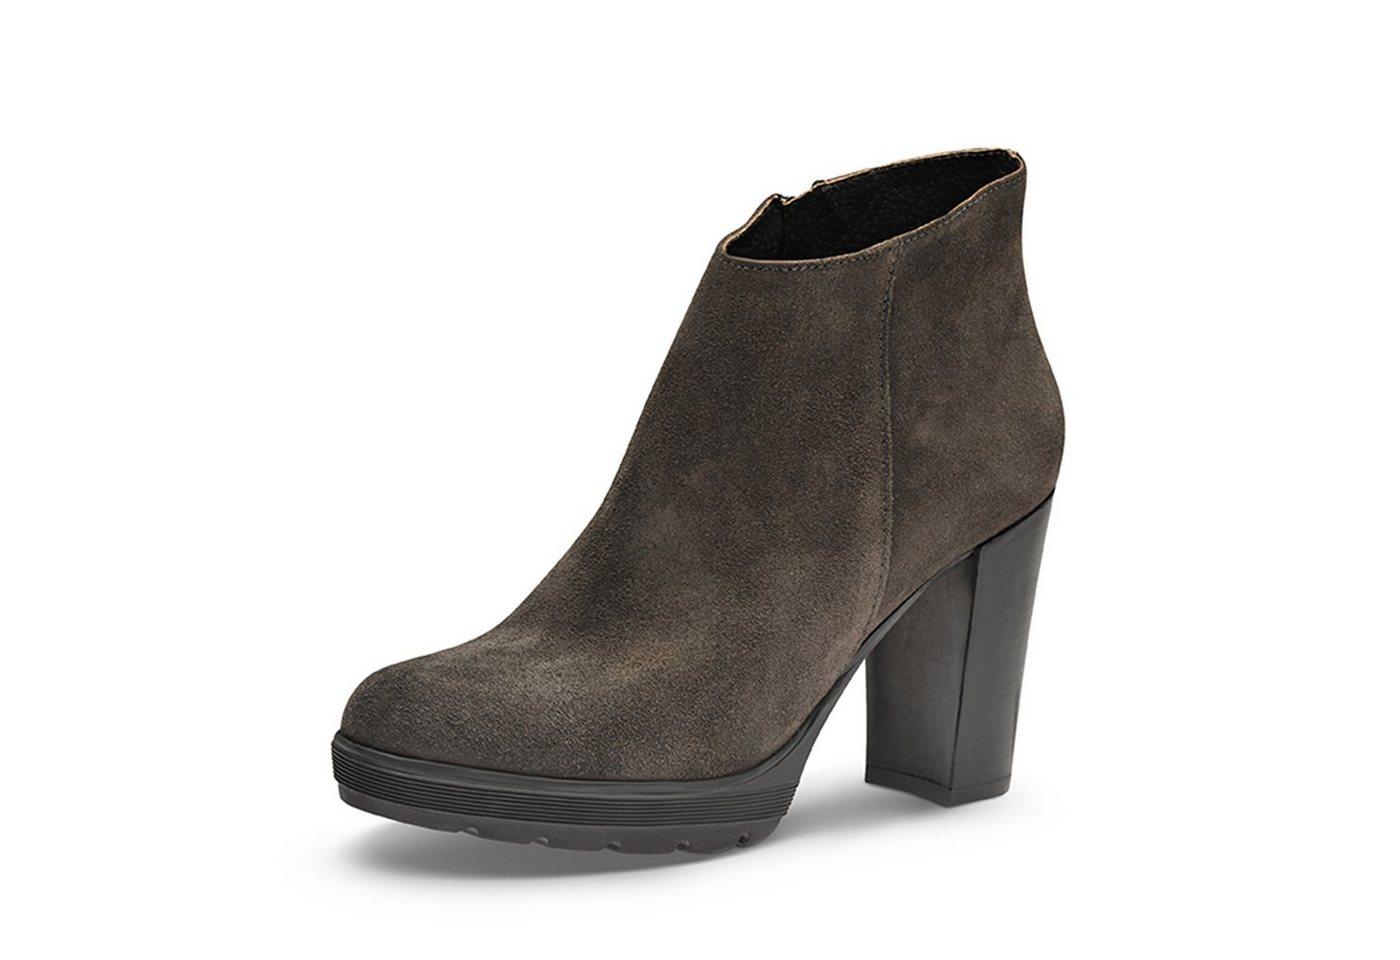 Evita »UBALDA« Plateaustiefelette | Schuhe > Stiefeletten > Plateaustiefeletten | Grau | Evita